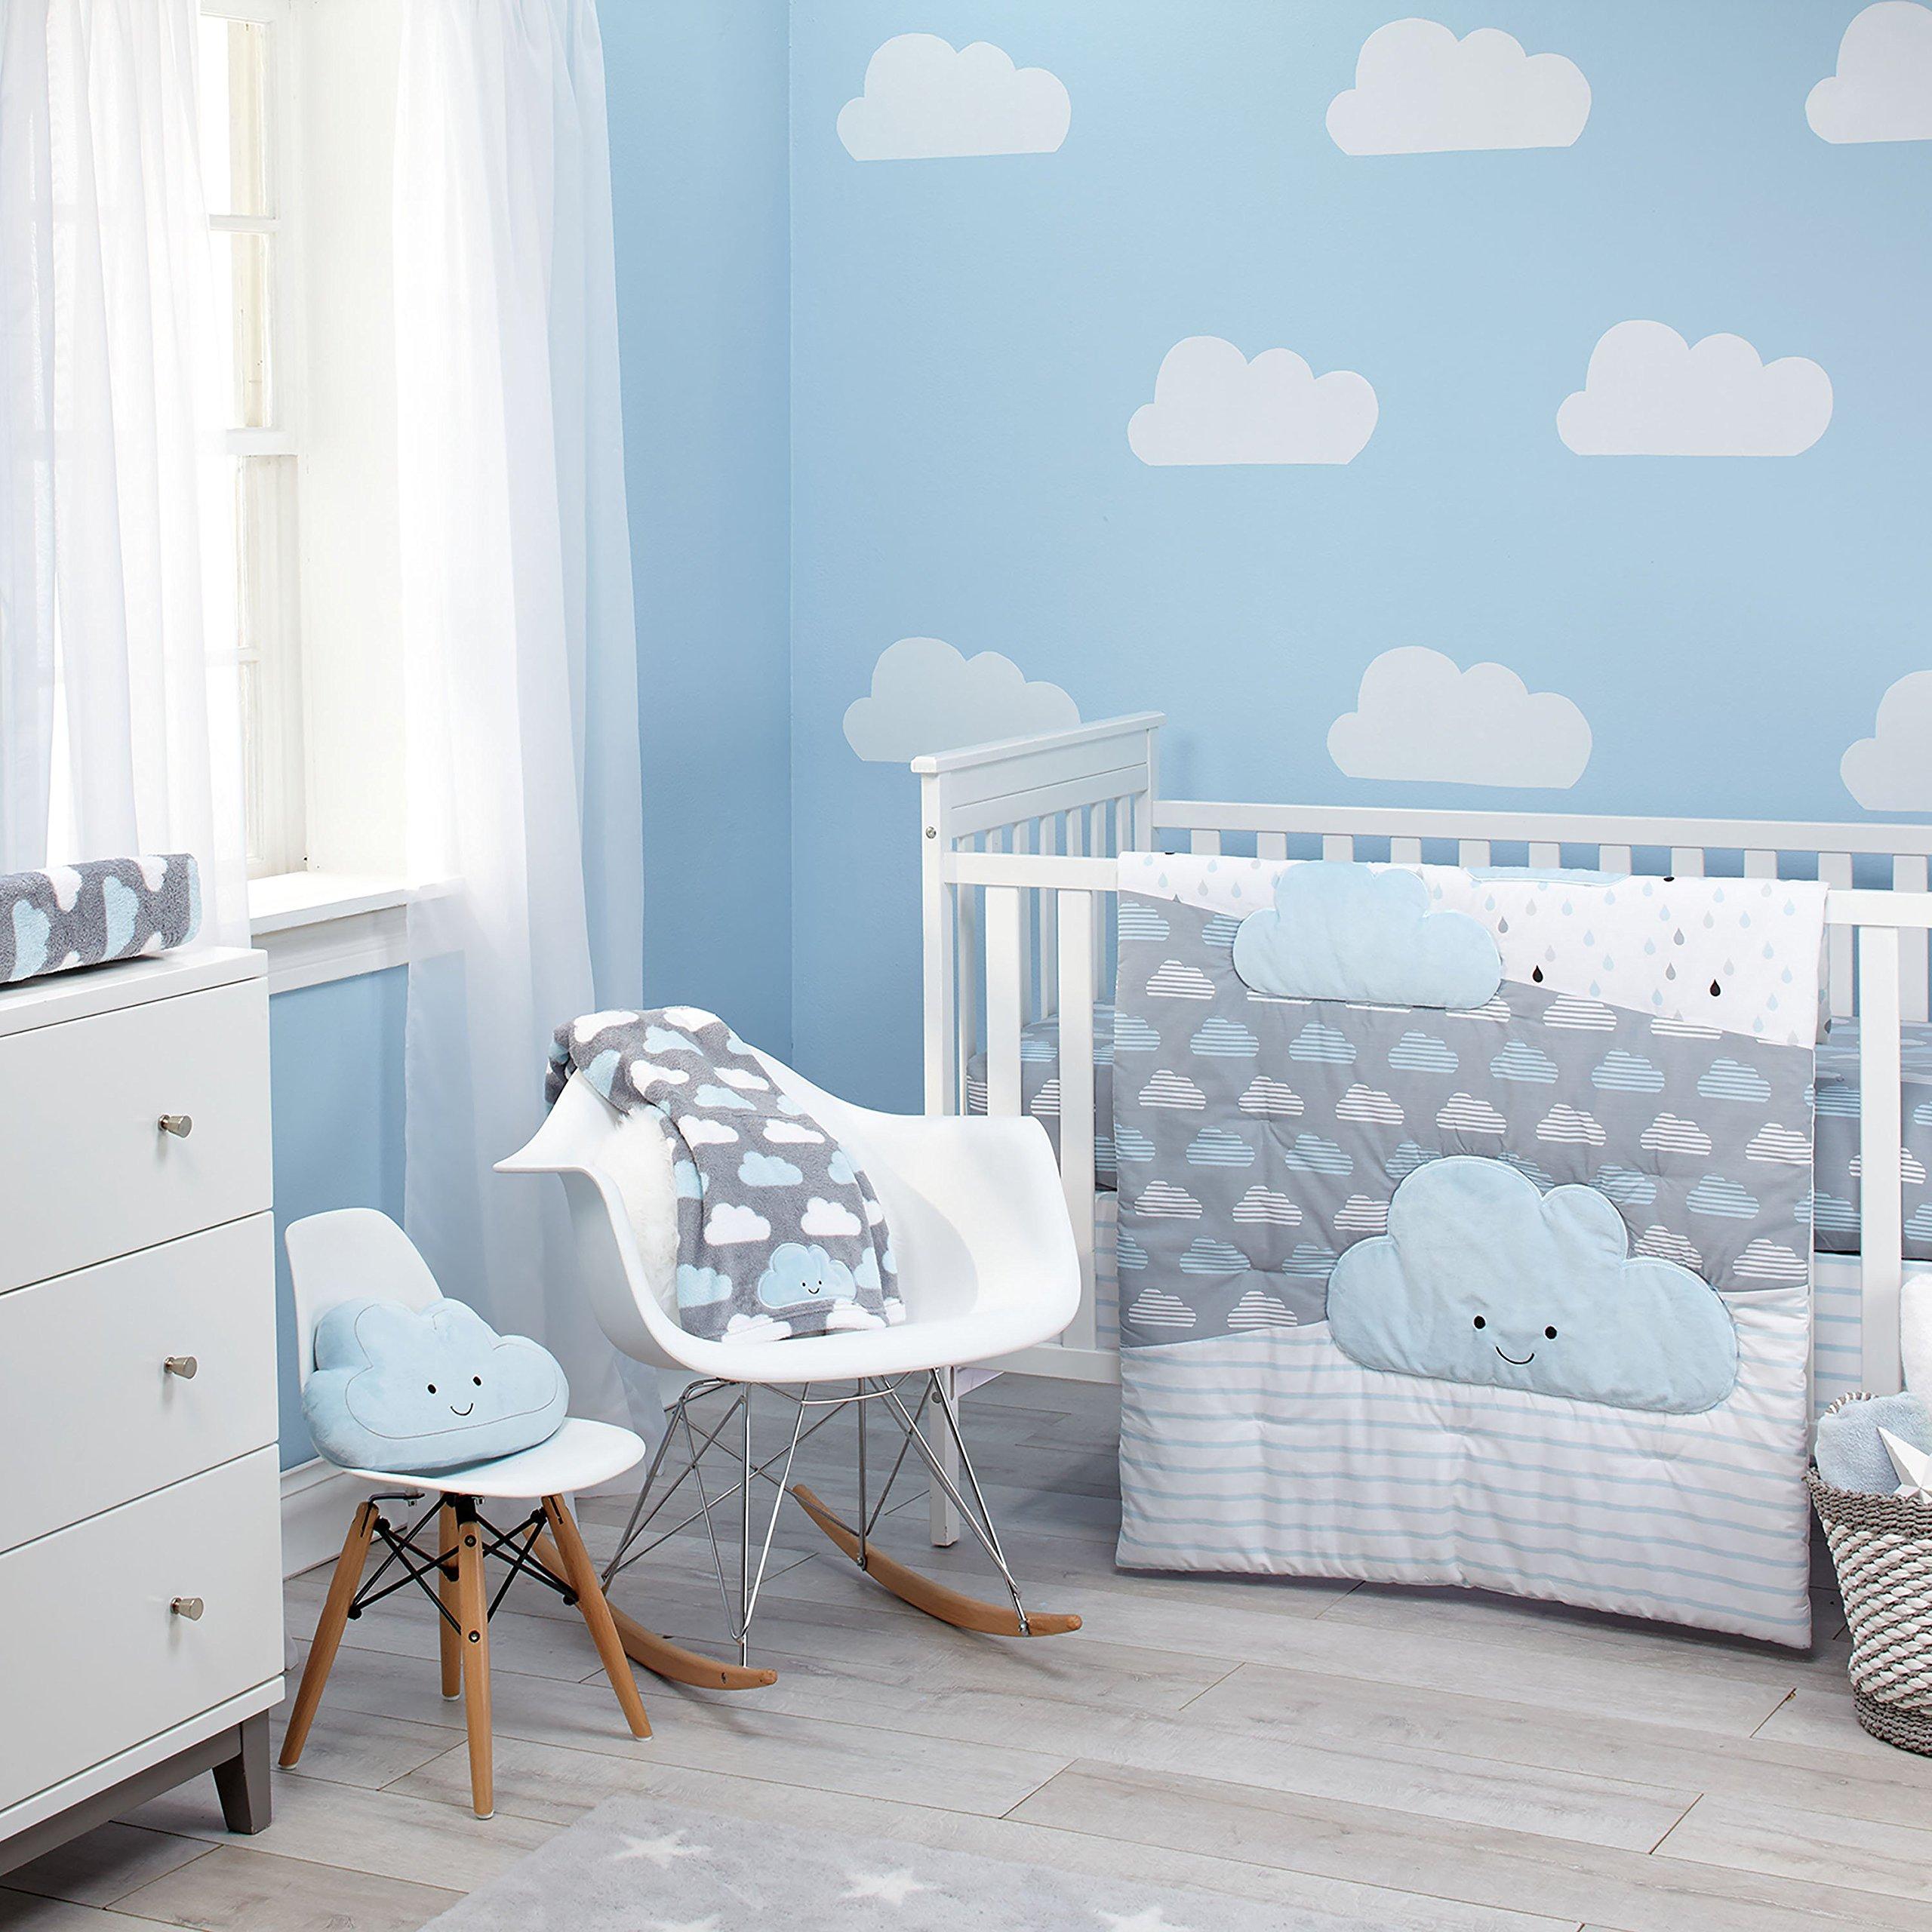 Little Love by NoJo 5 Piece Comforter Set, Happy Little Clouds